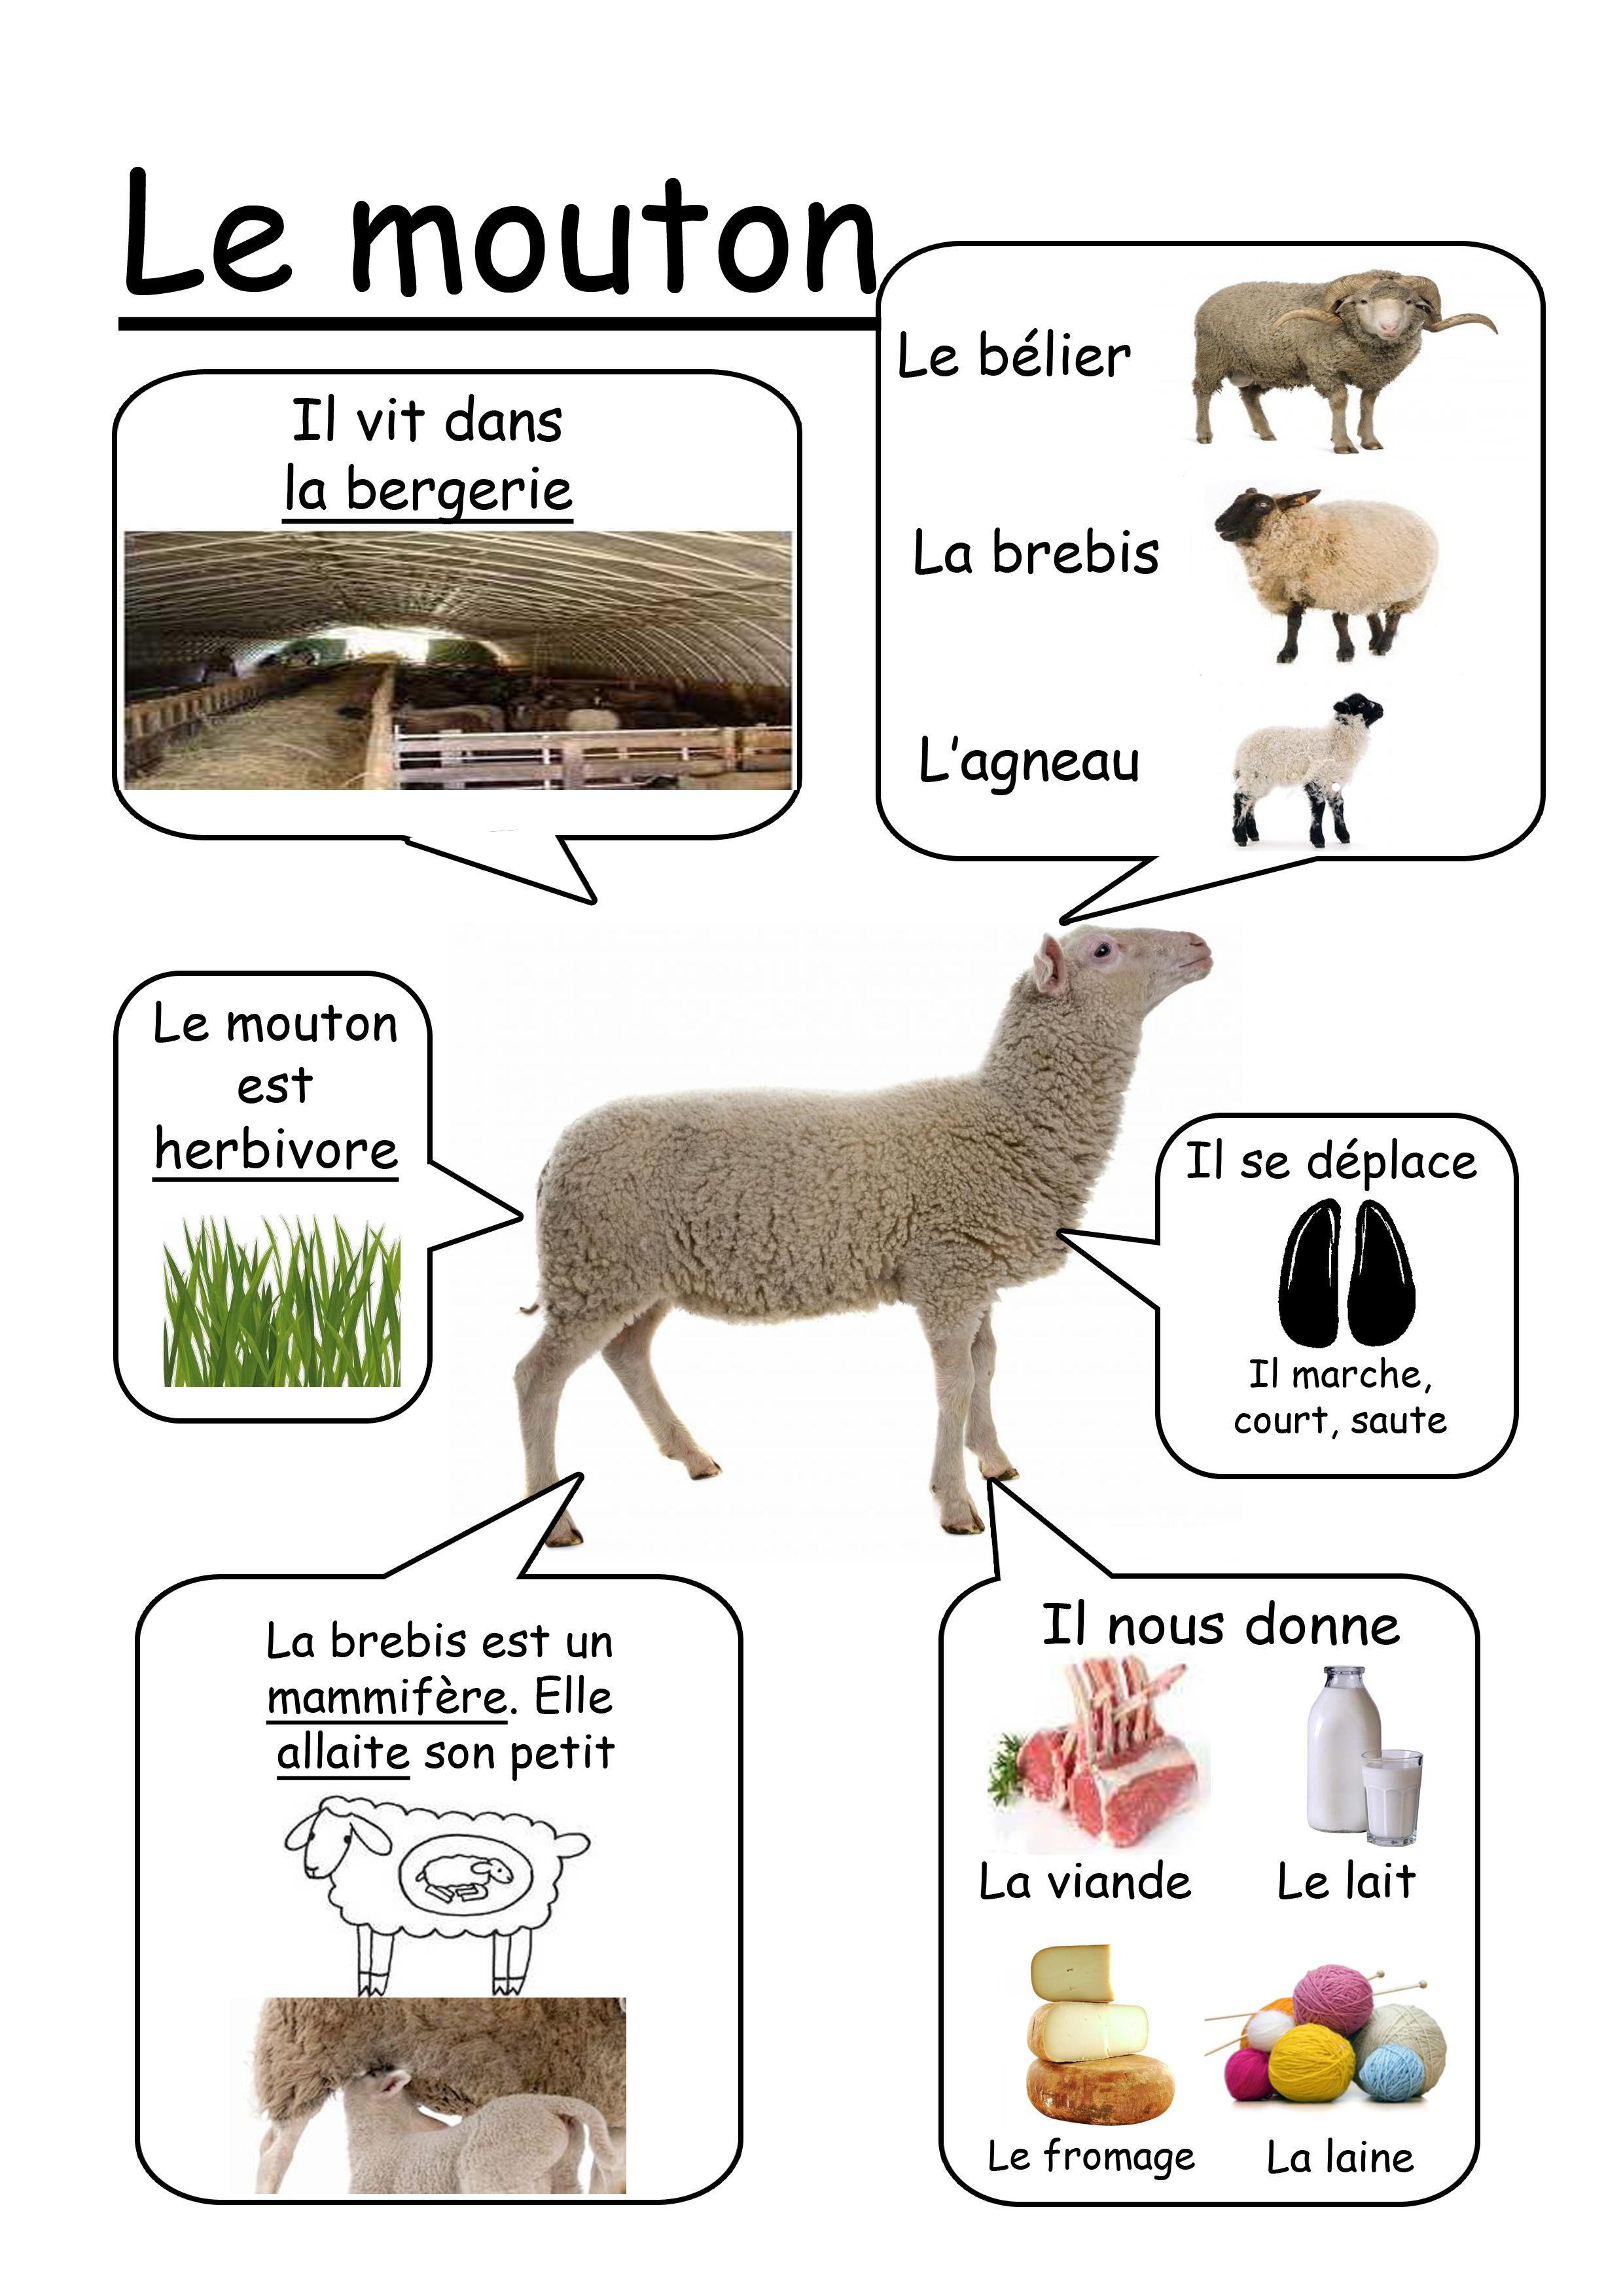 Mouton - Animaux de la ferme | Haziallatok | Pinterest | Französisch ...